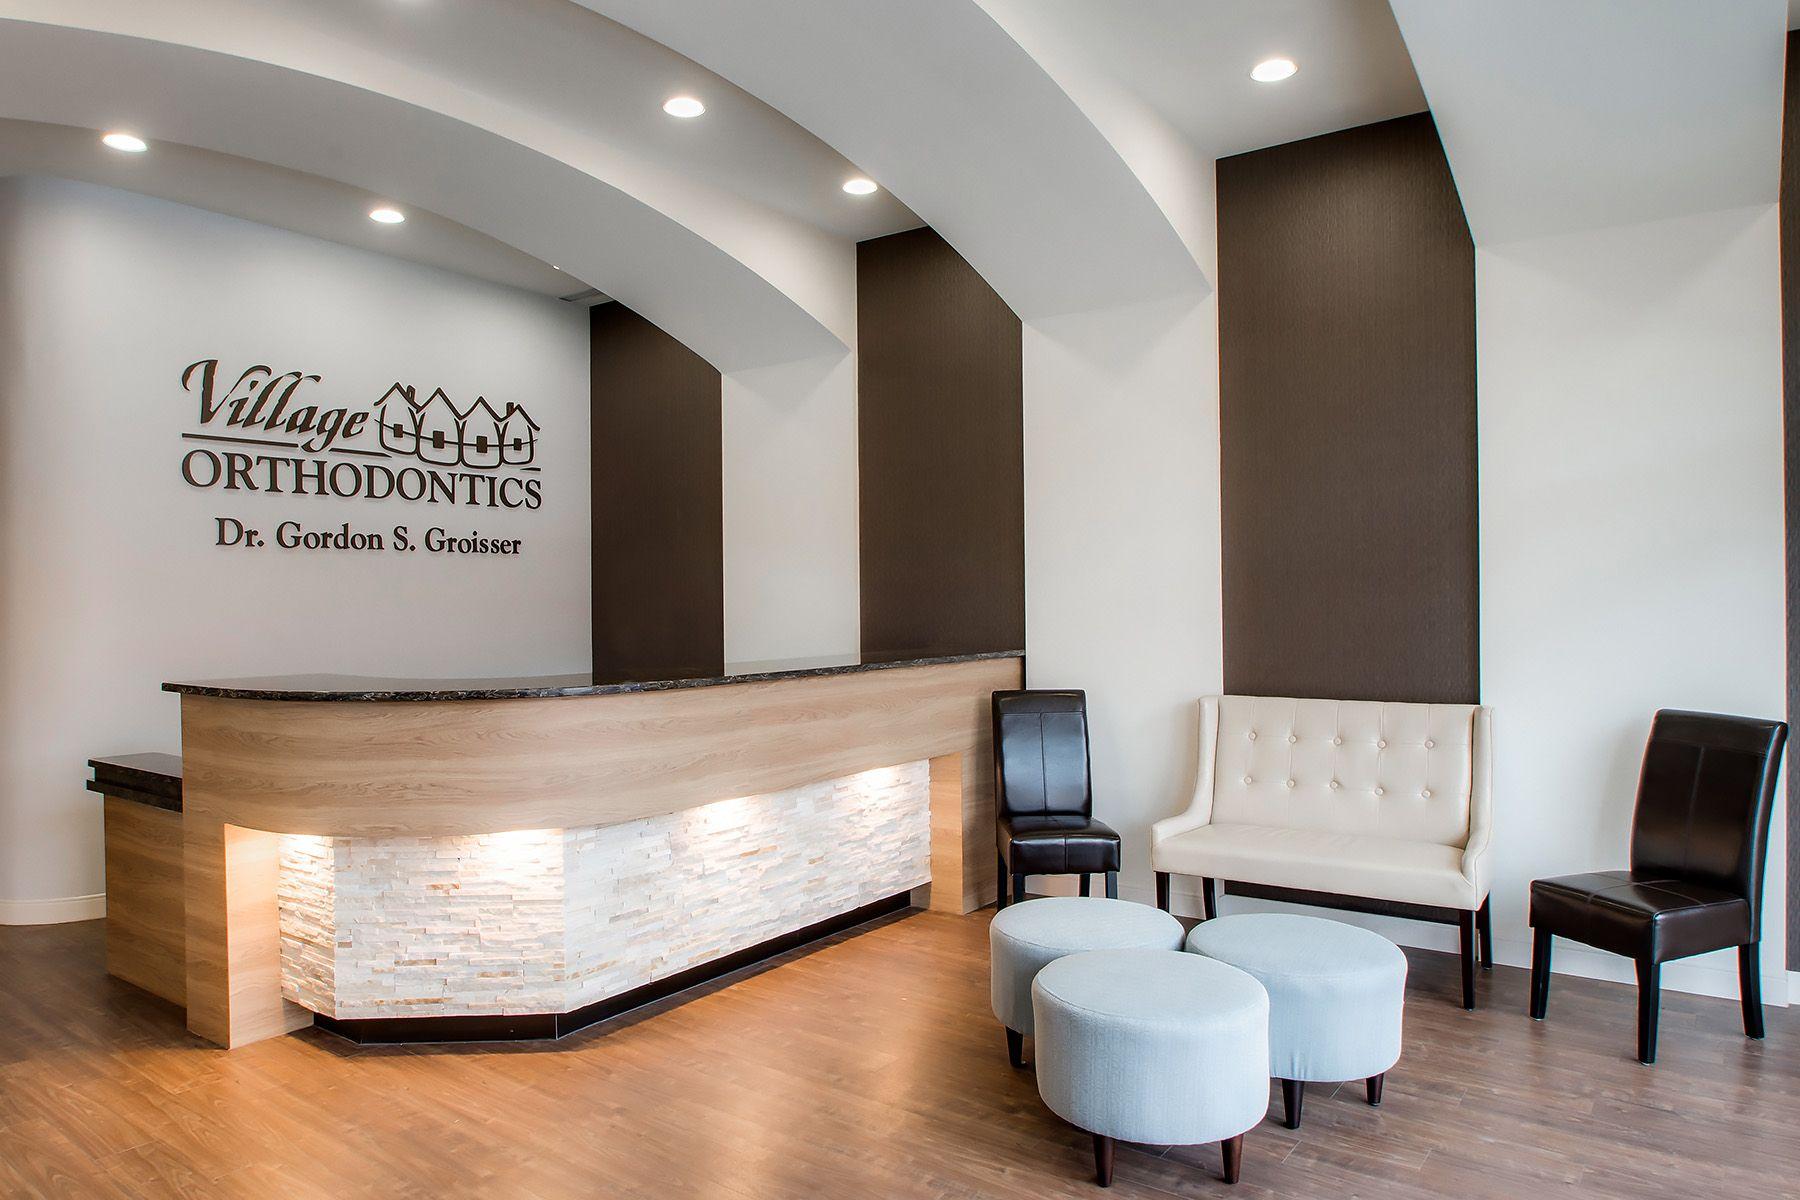 Village Orthodontics Dental Office Decor Dental Office Design